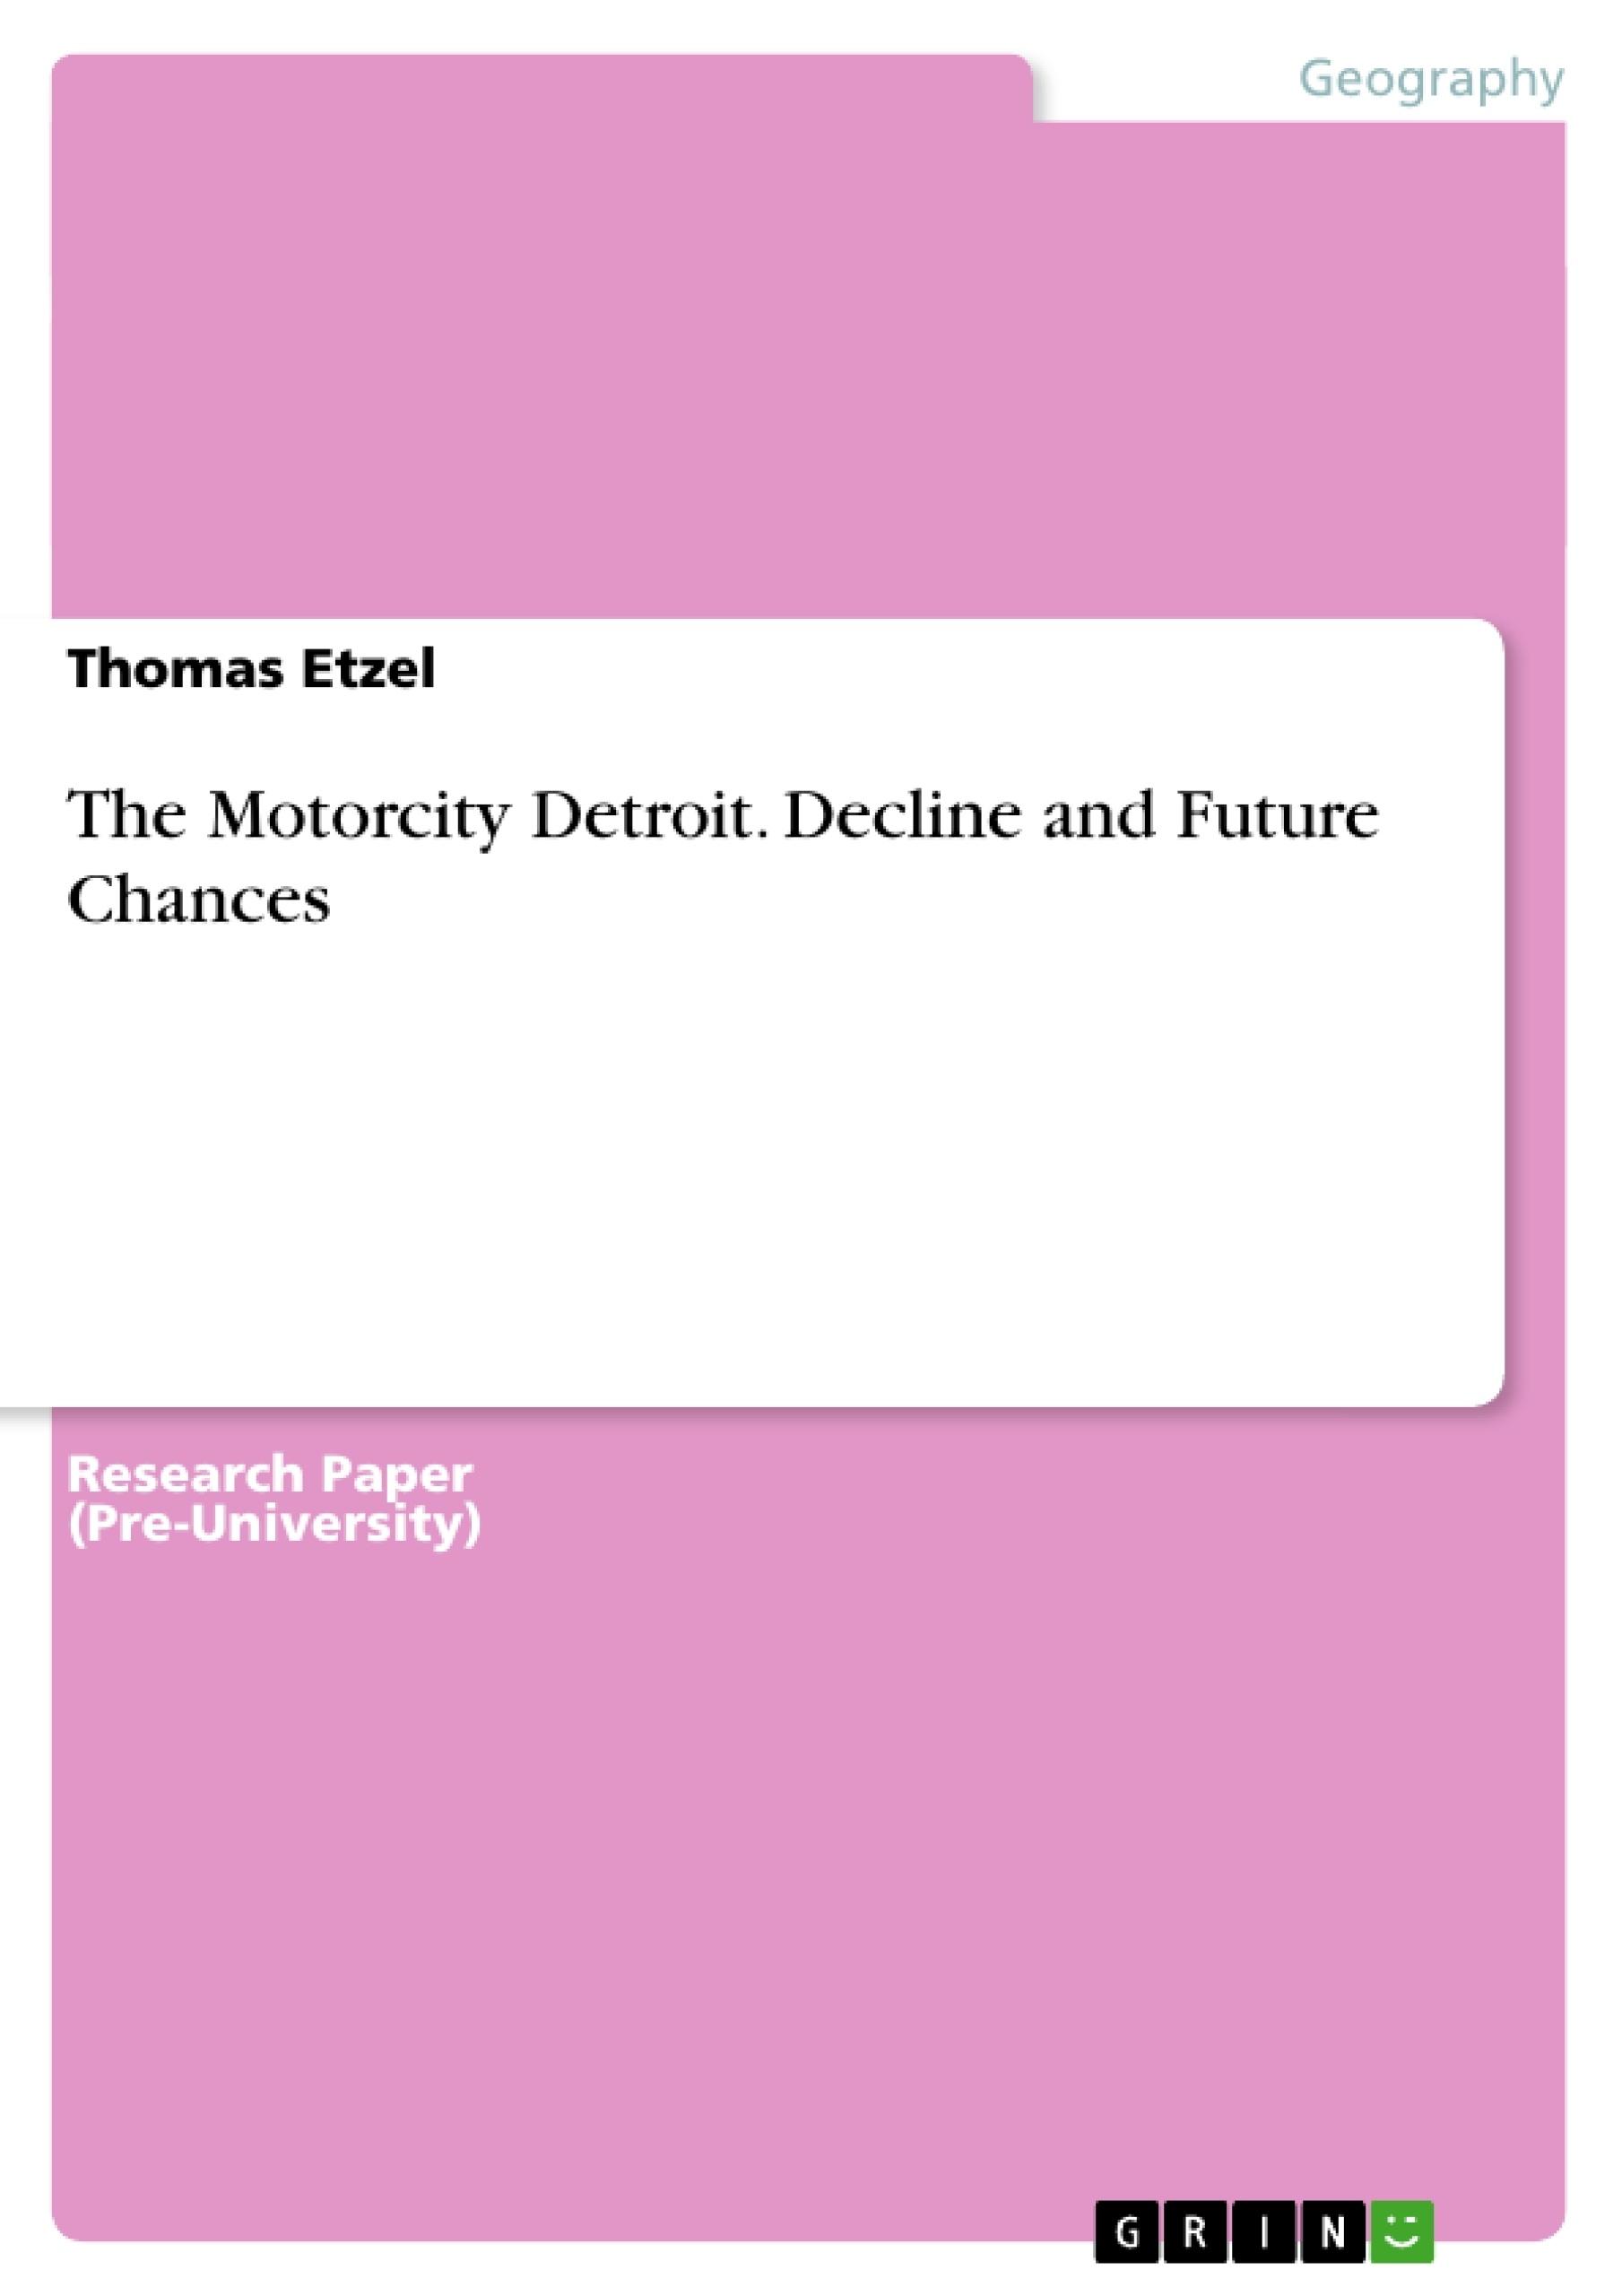 Title: The Motorcity Detroit. Decline and Future Chances